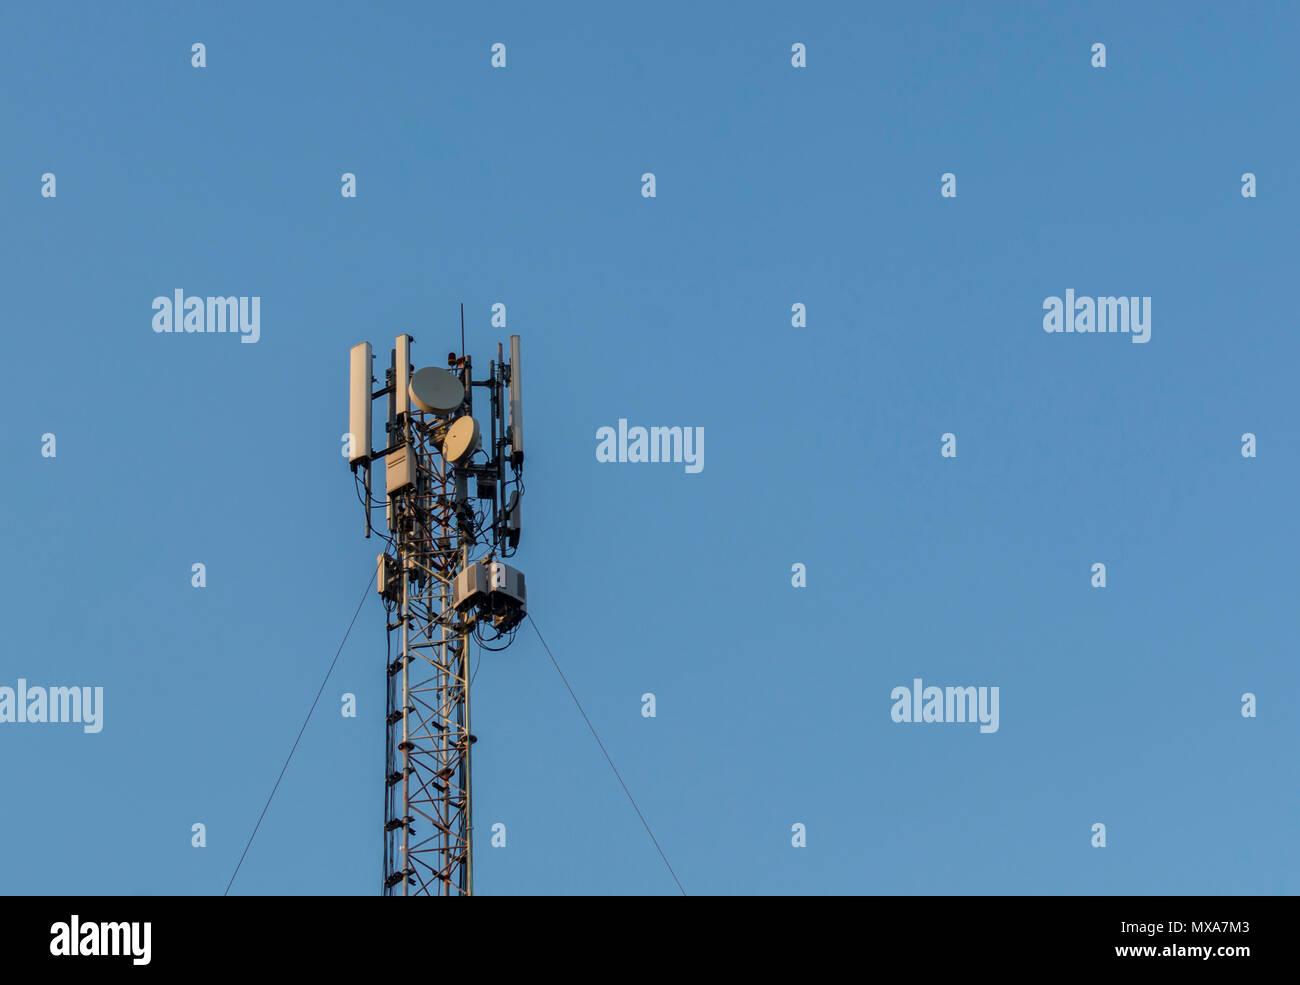 Mobile Network Antenna Stock Photos & Mobile Network